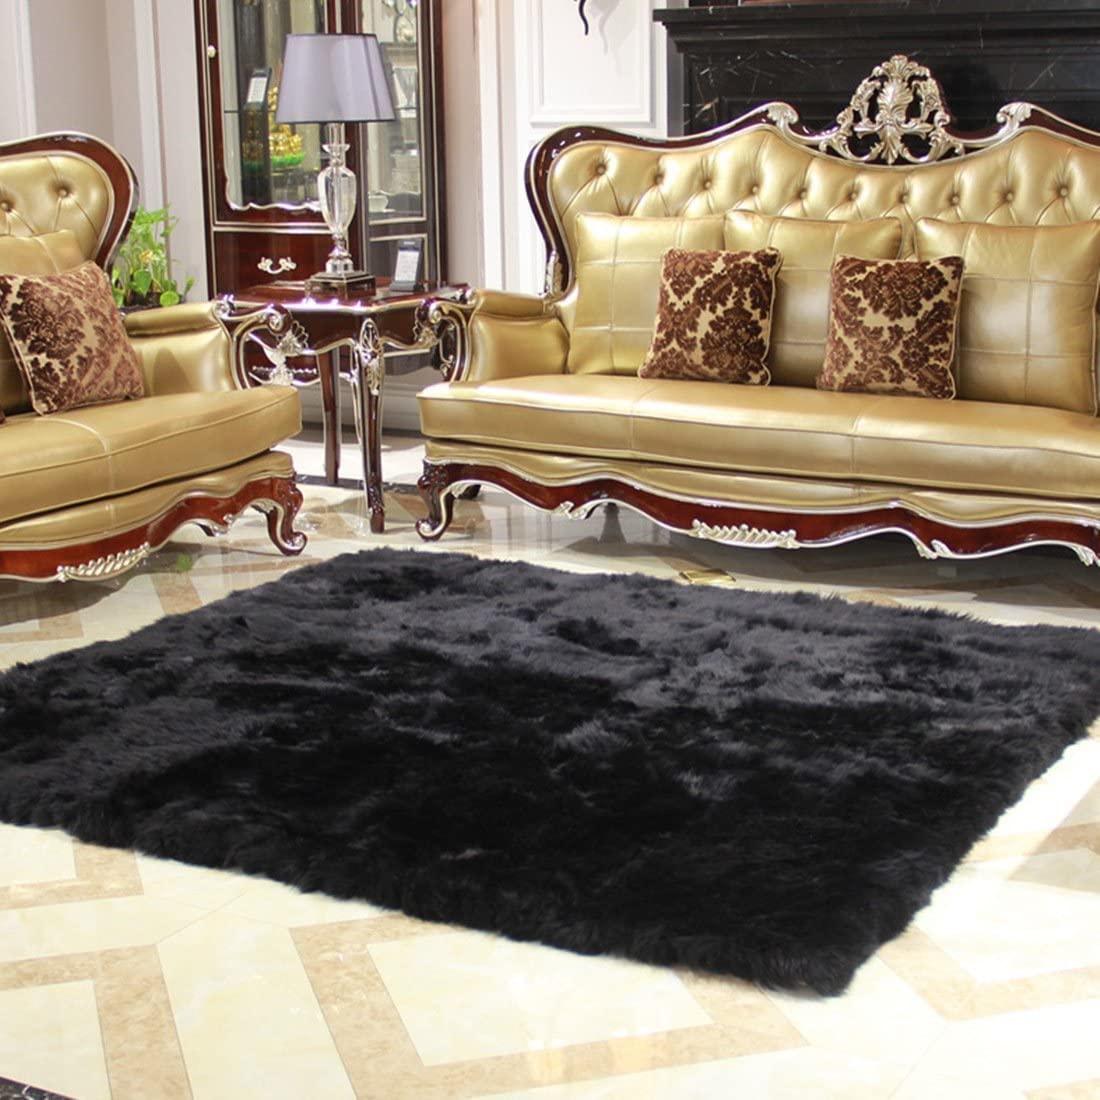 Elhouse Home Decor Square Rugs Faux Fur Sheepskin Area Rug Shaggy Carpet Fluffy Rug for Baby Bedroom,8ftx10ft,Black